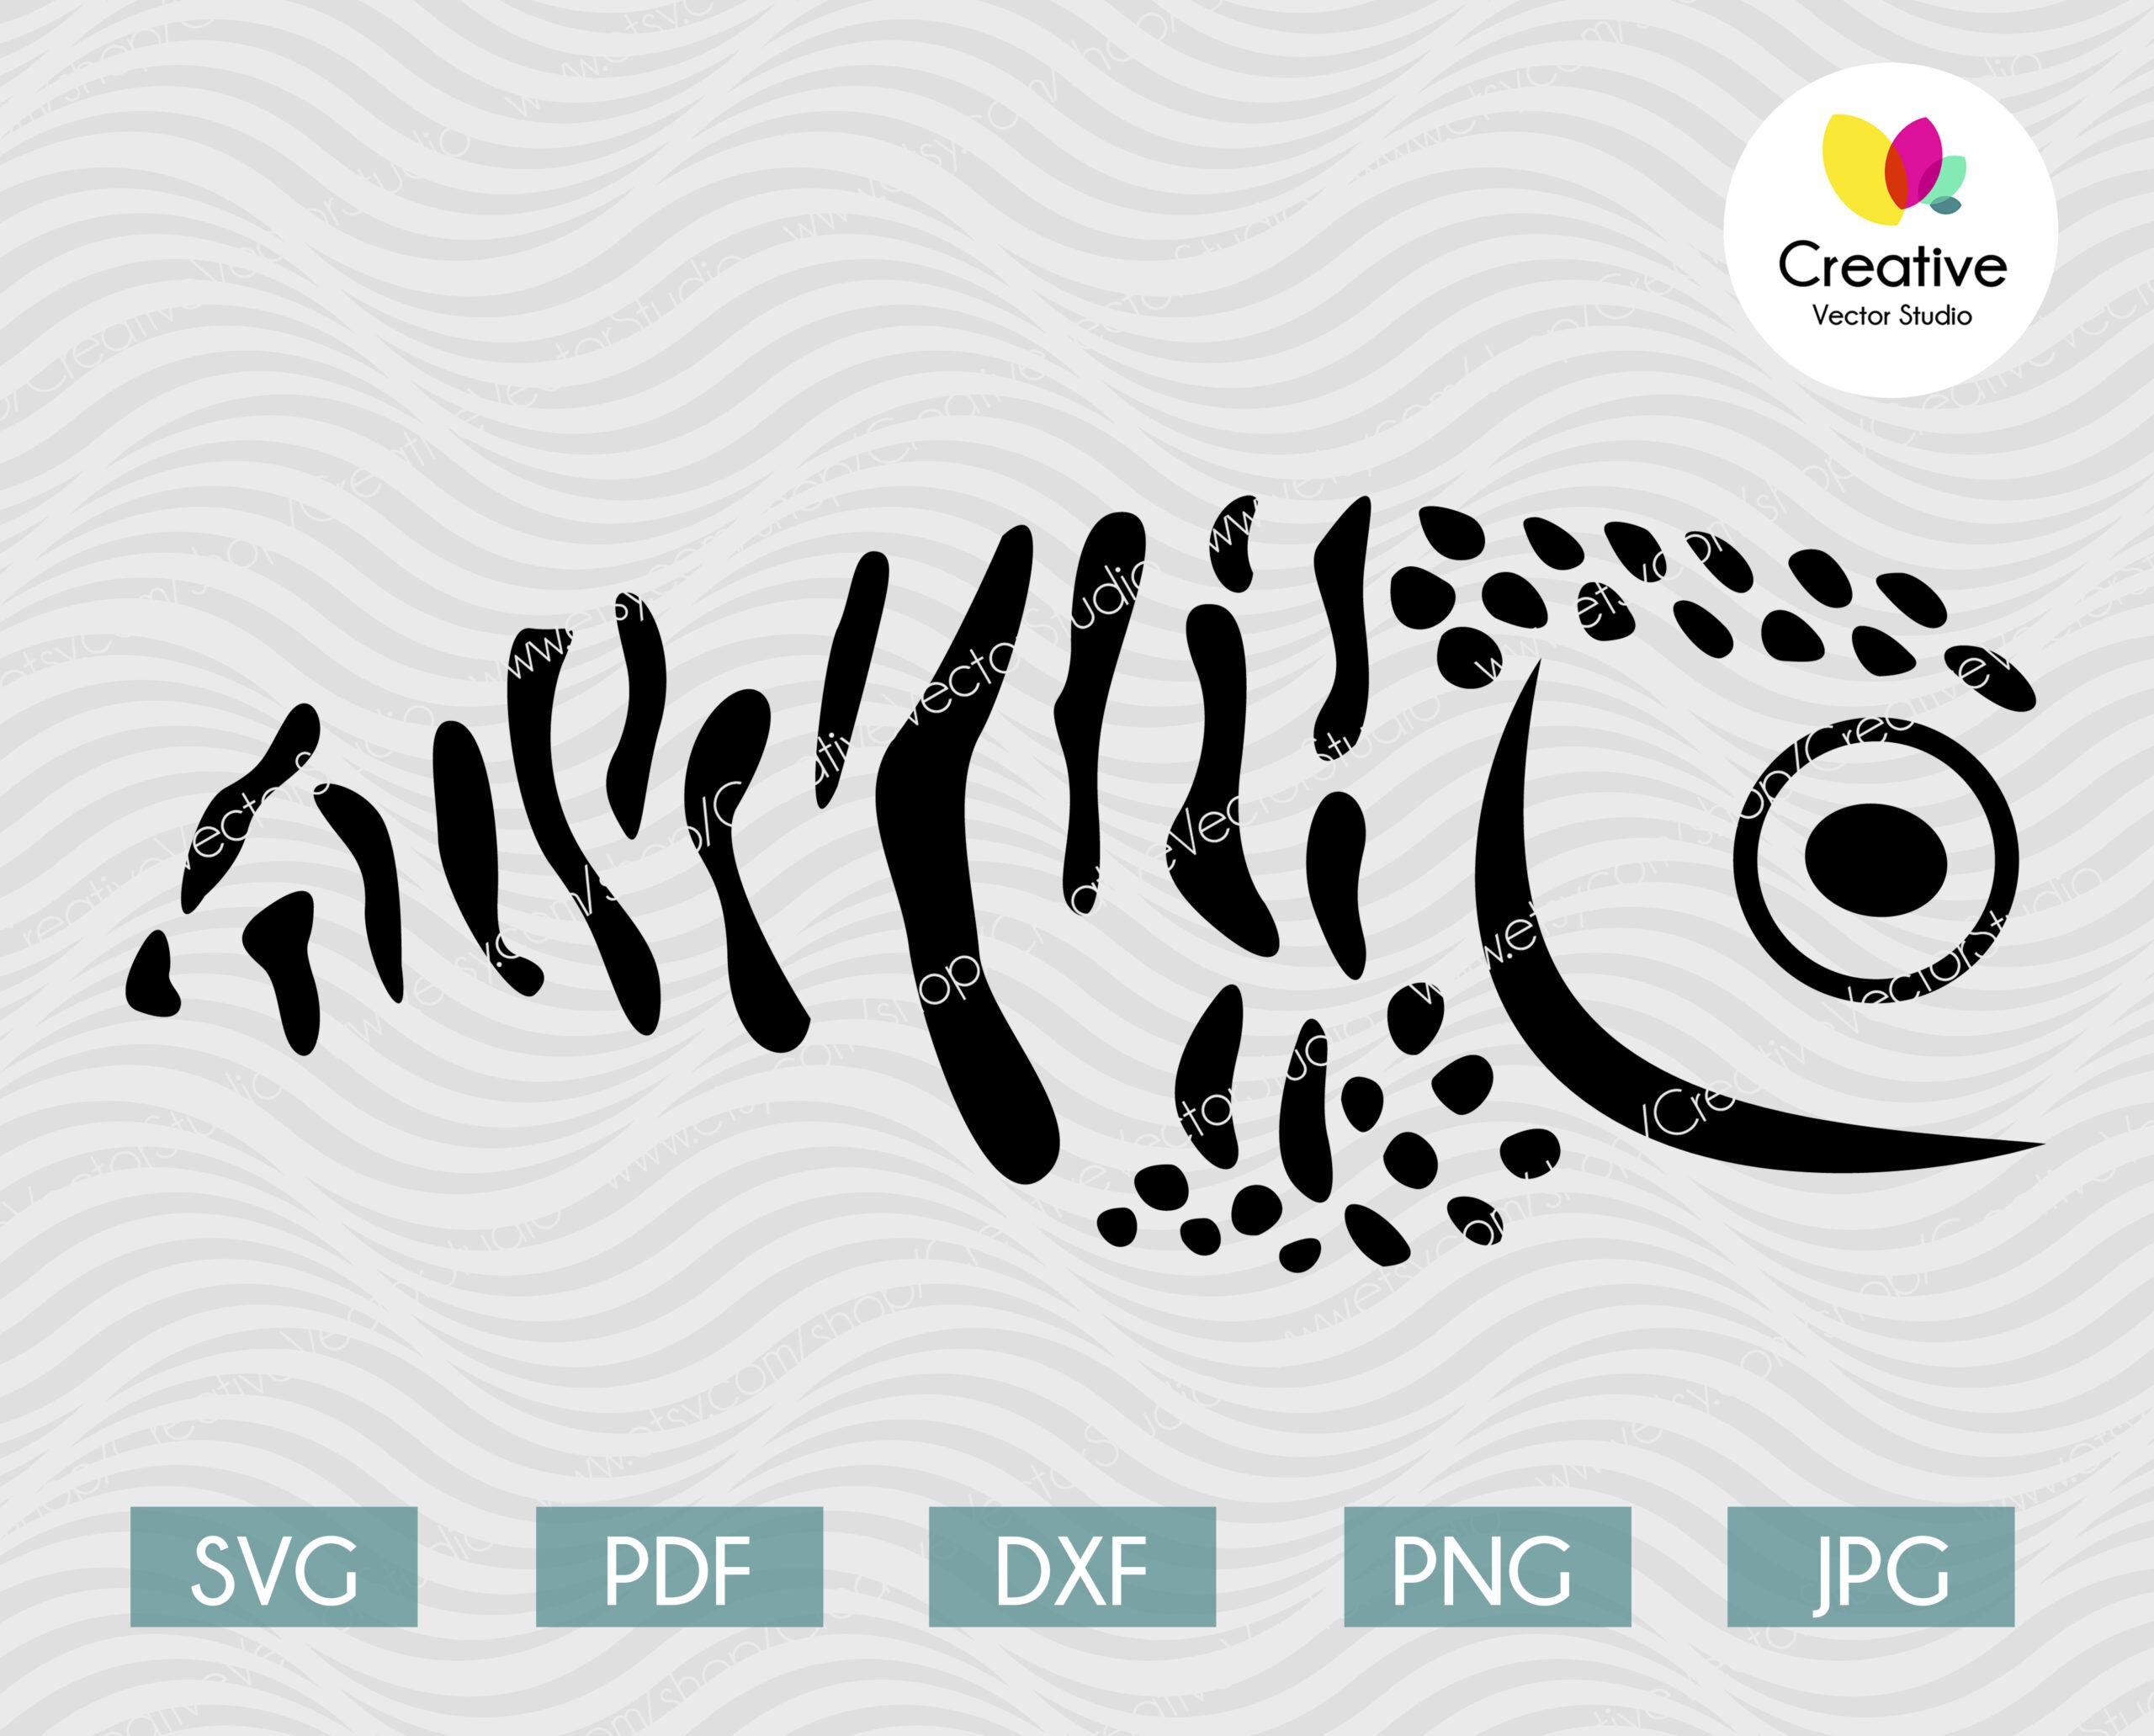 Download Fishing Lure Svg 31 Cut File Image Creative Vector Studio